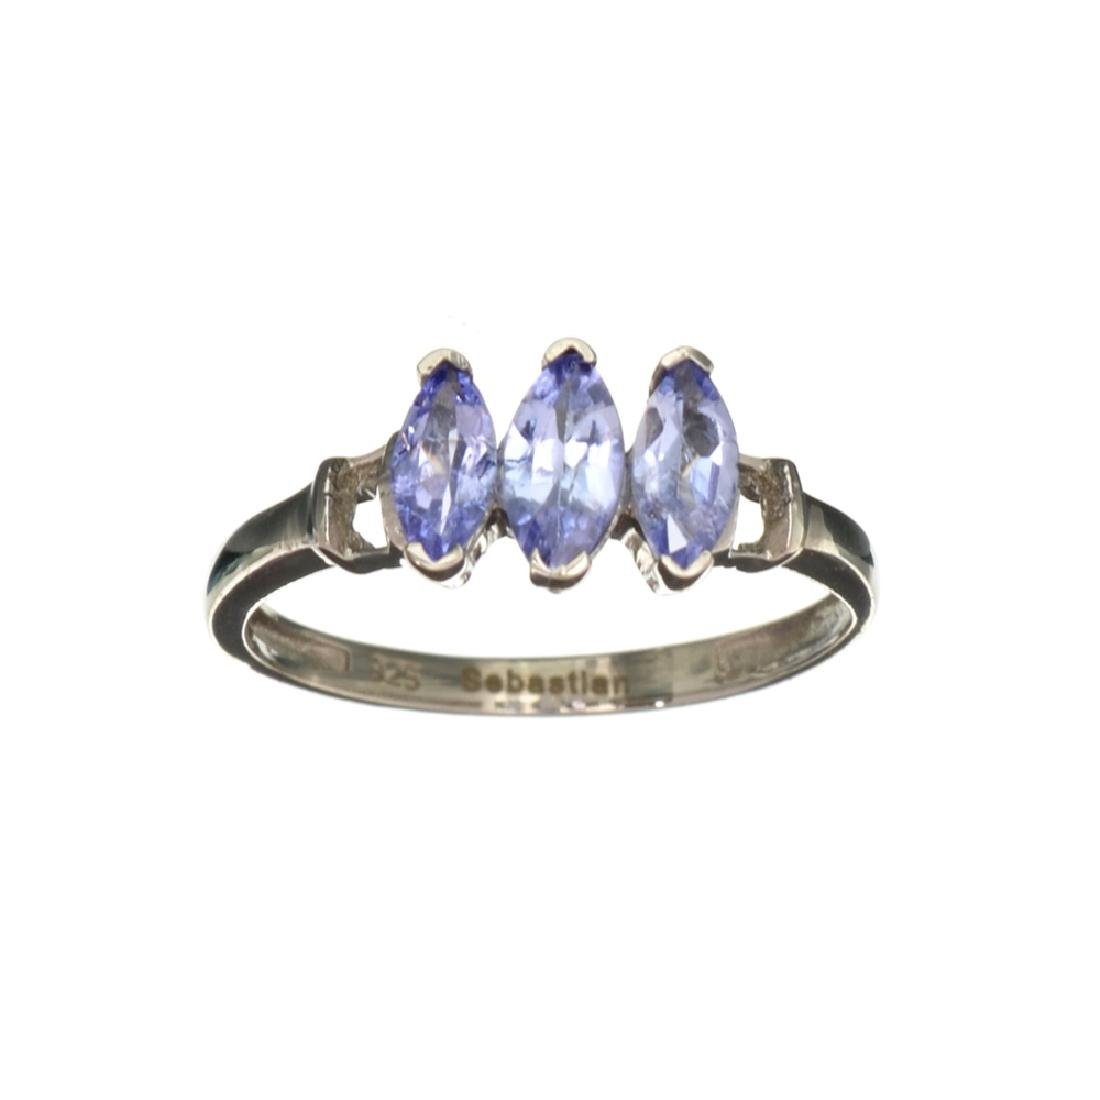 APP: 0.9k Fine Jewelry 0.40CT Marquise Cut Tanzanite